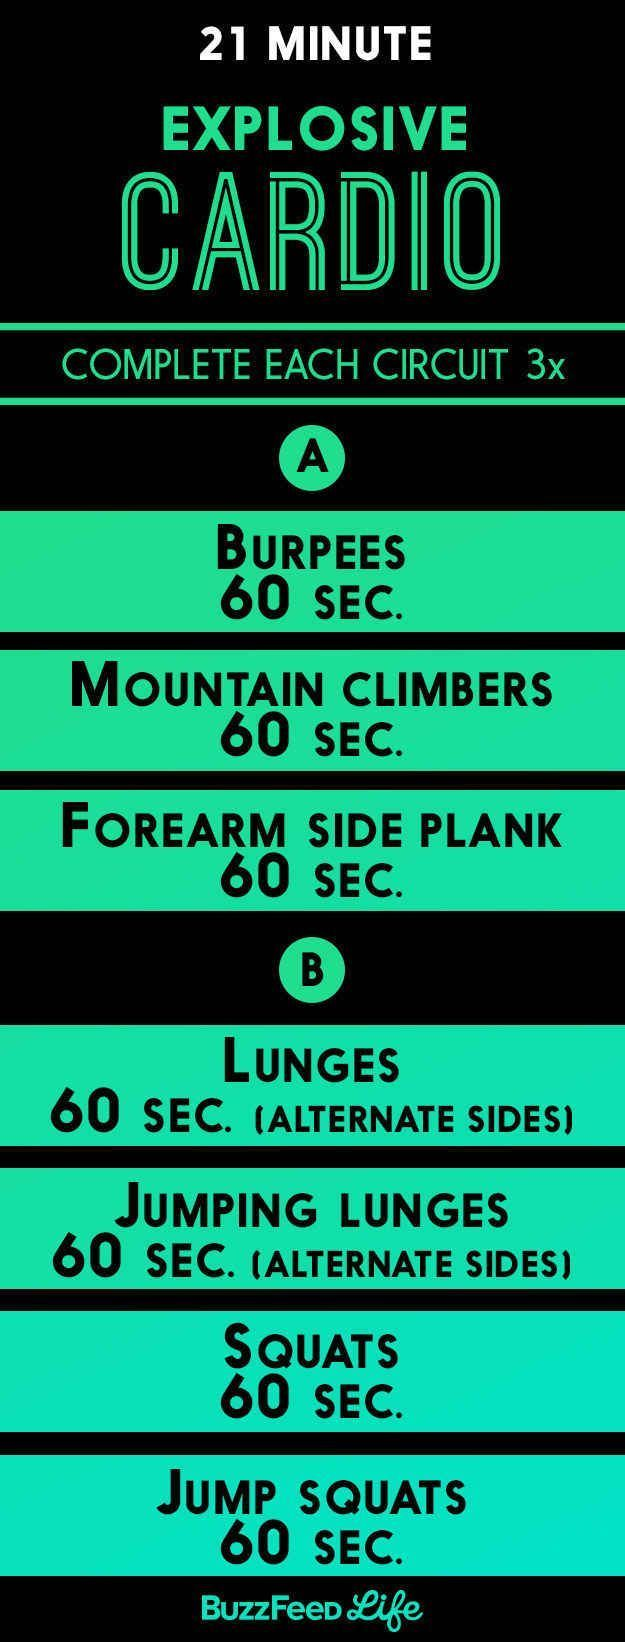 #thefitapp #fitness #health #app #workout #workforit #cardio #weightloss #lean…